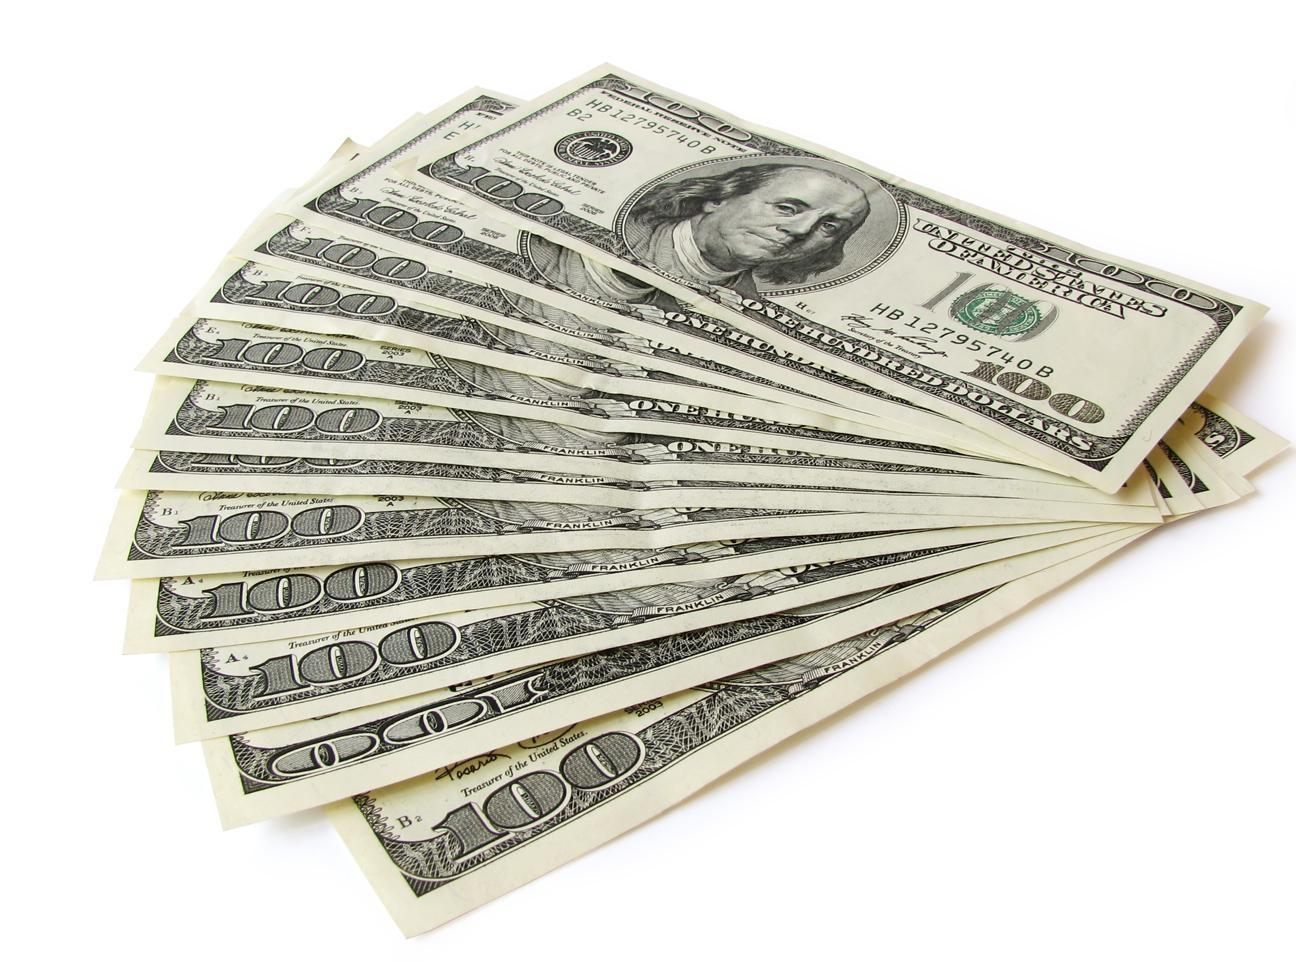 Картинки долларов на белом фоне